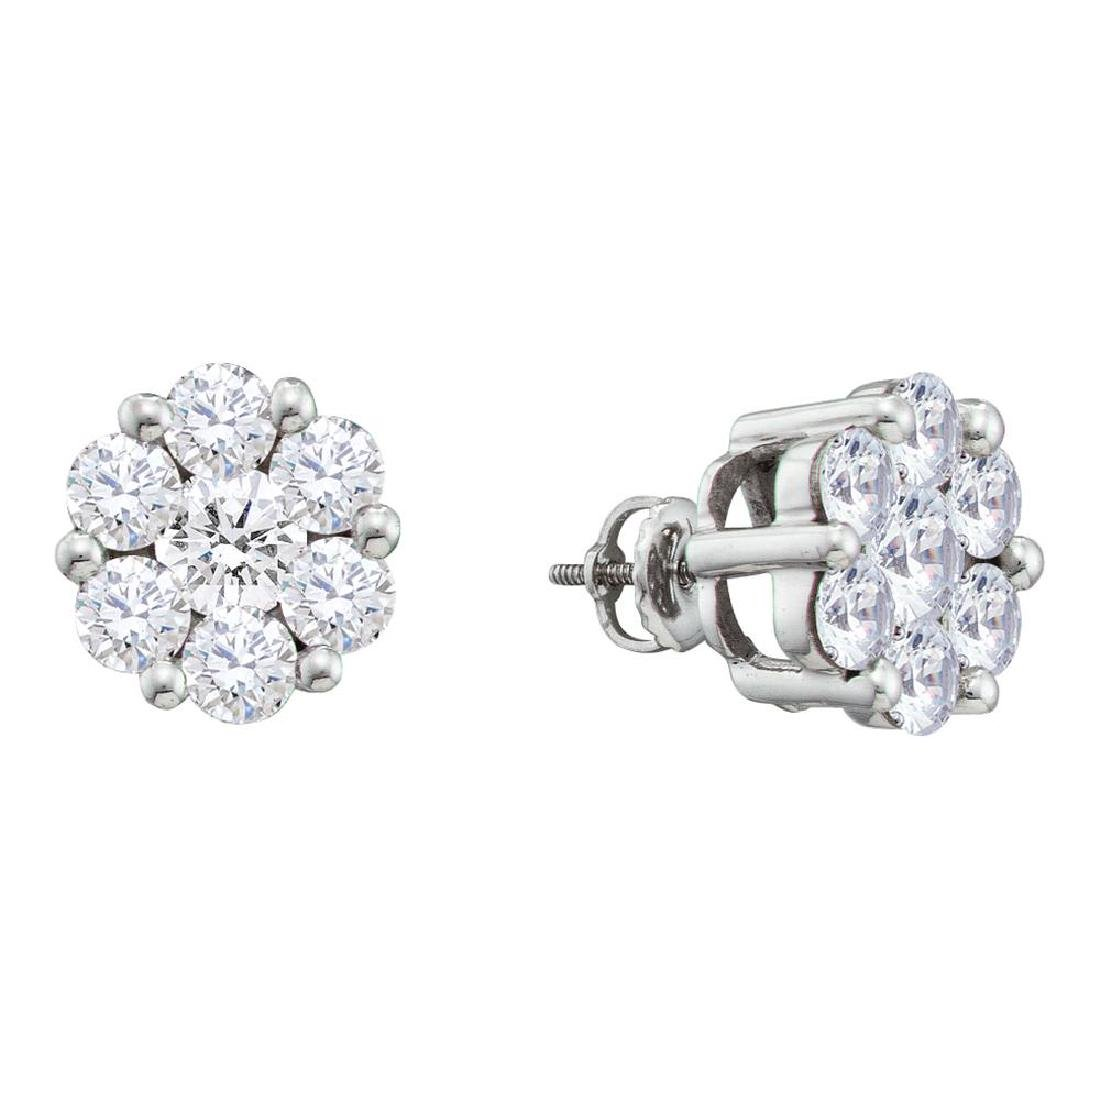 1.5 CTW Diamond Large Flower Cluster Stud Earrings 14KT